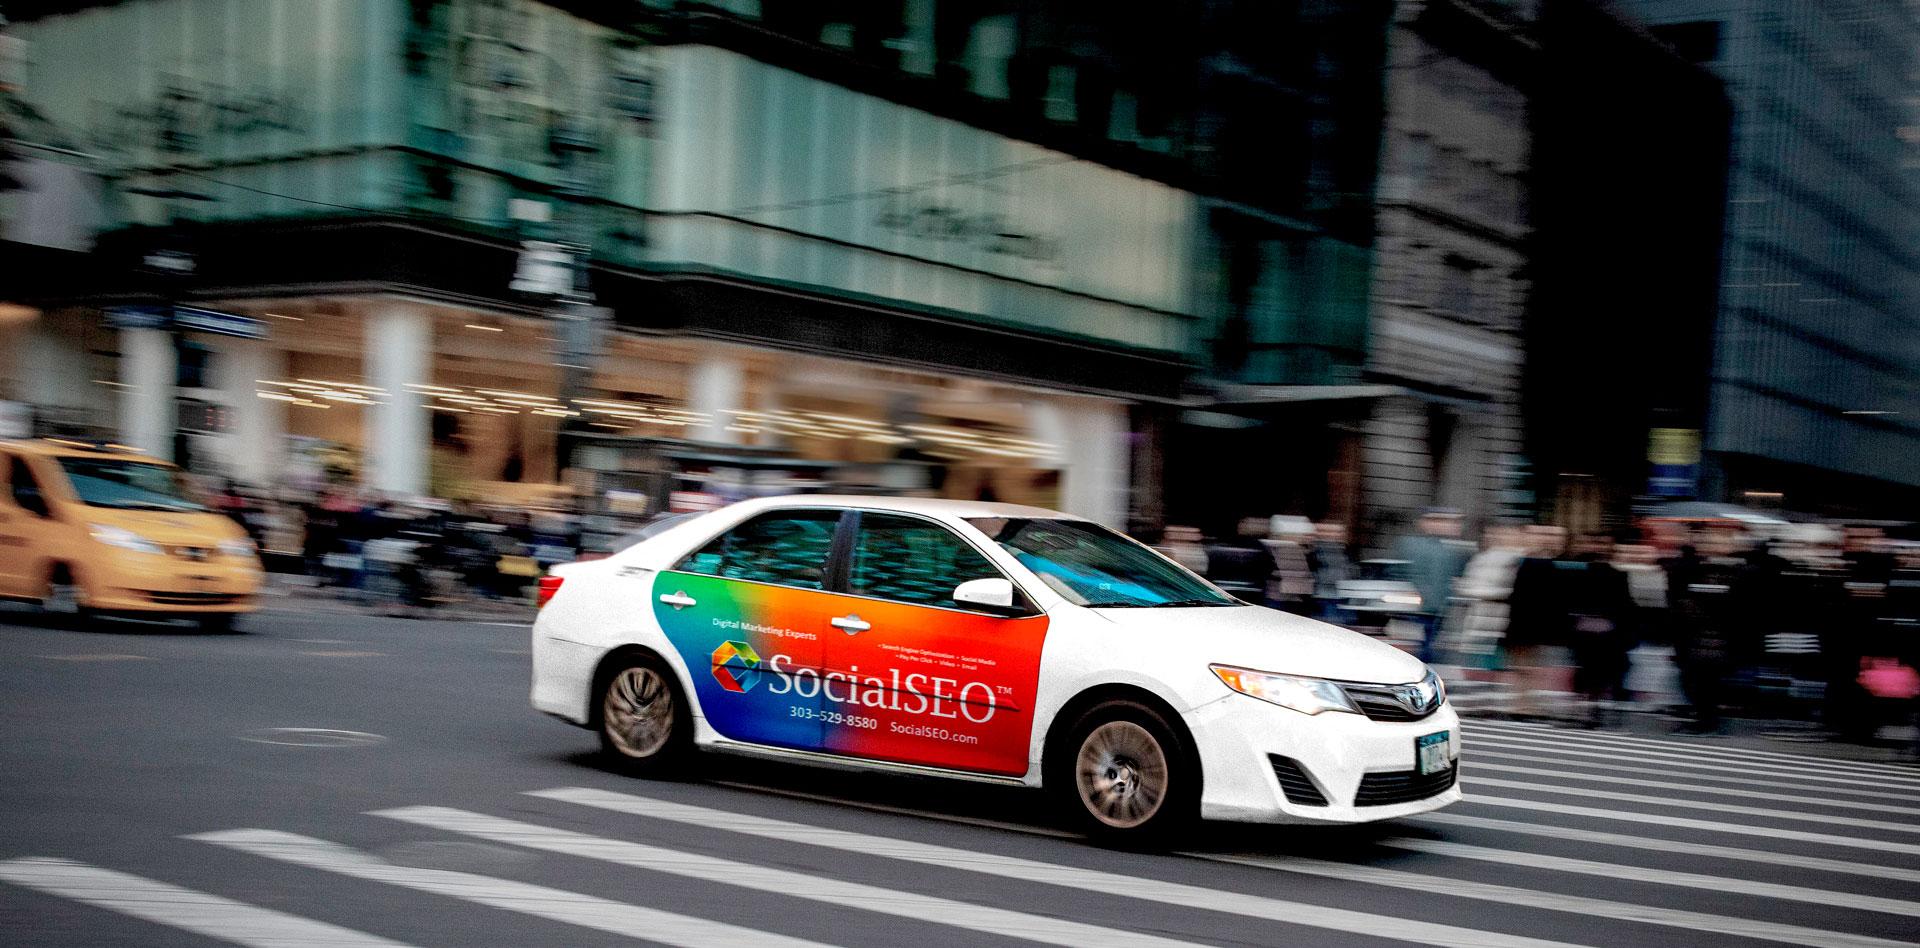 Nickelytics Social SEO Car Wrap Advertising